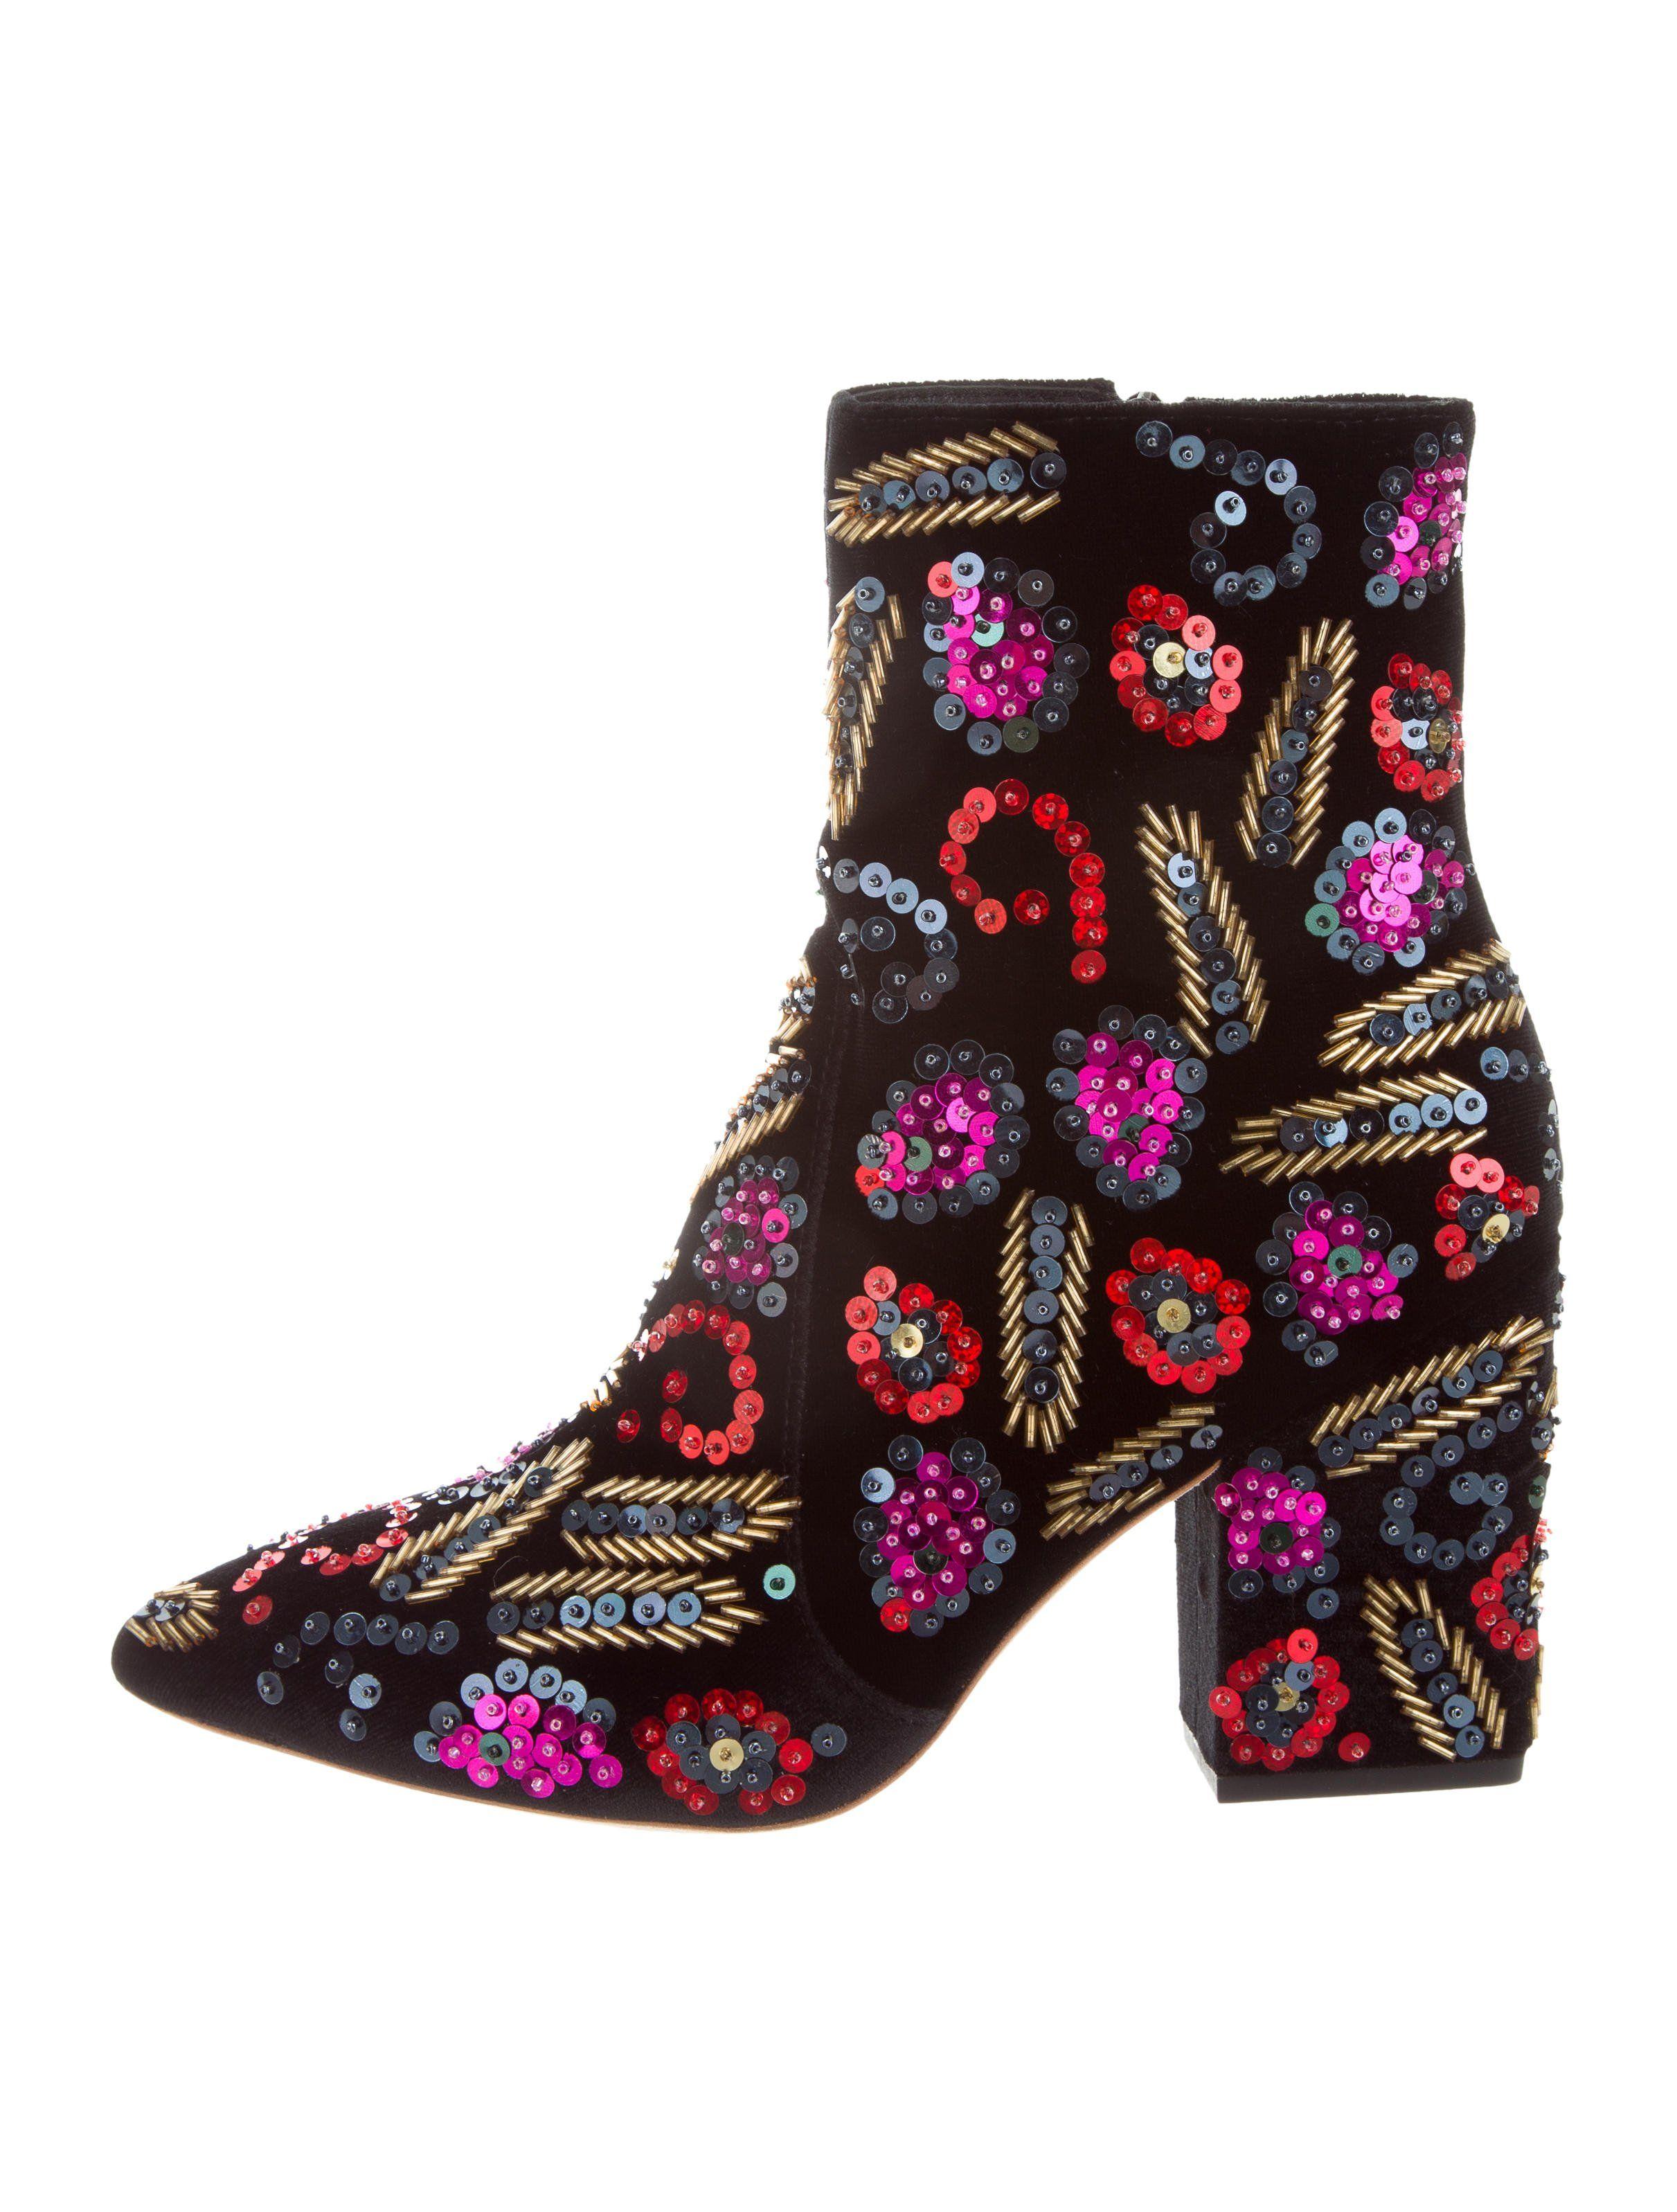 a20b4b5c948 Pin by Iris Ntanakos on A shoes heels embellished rhinestone ...